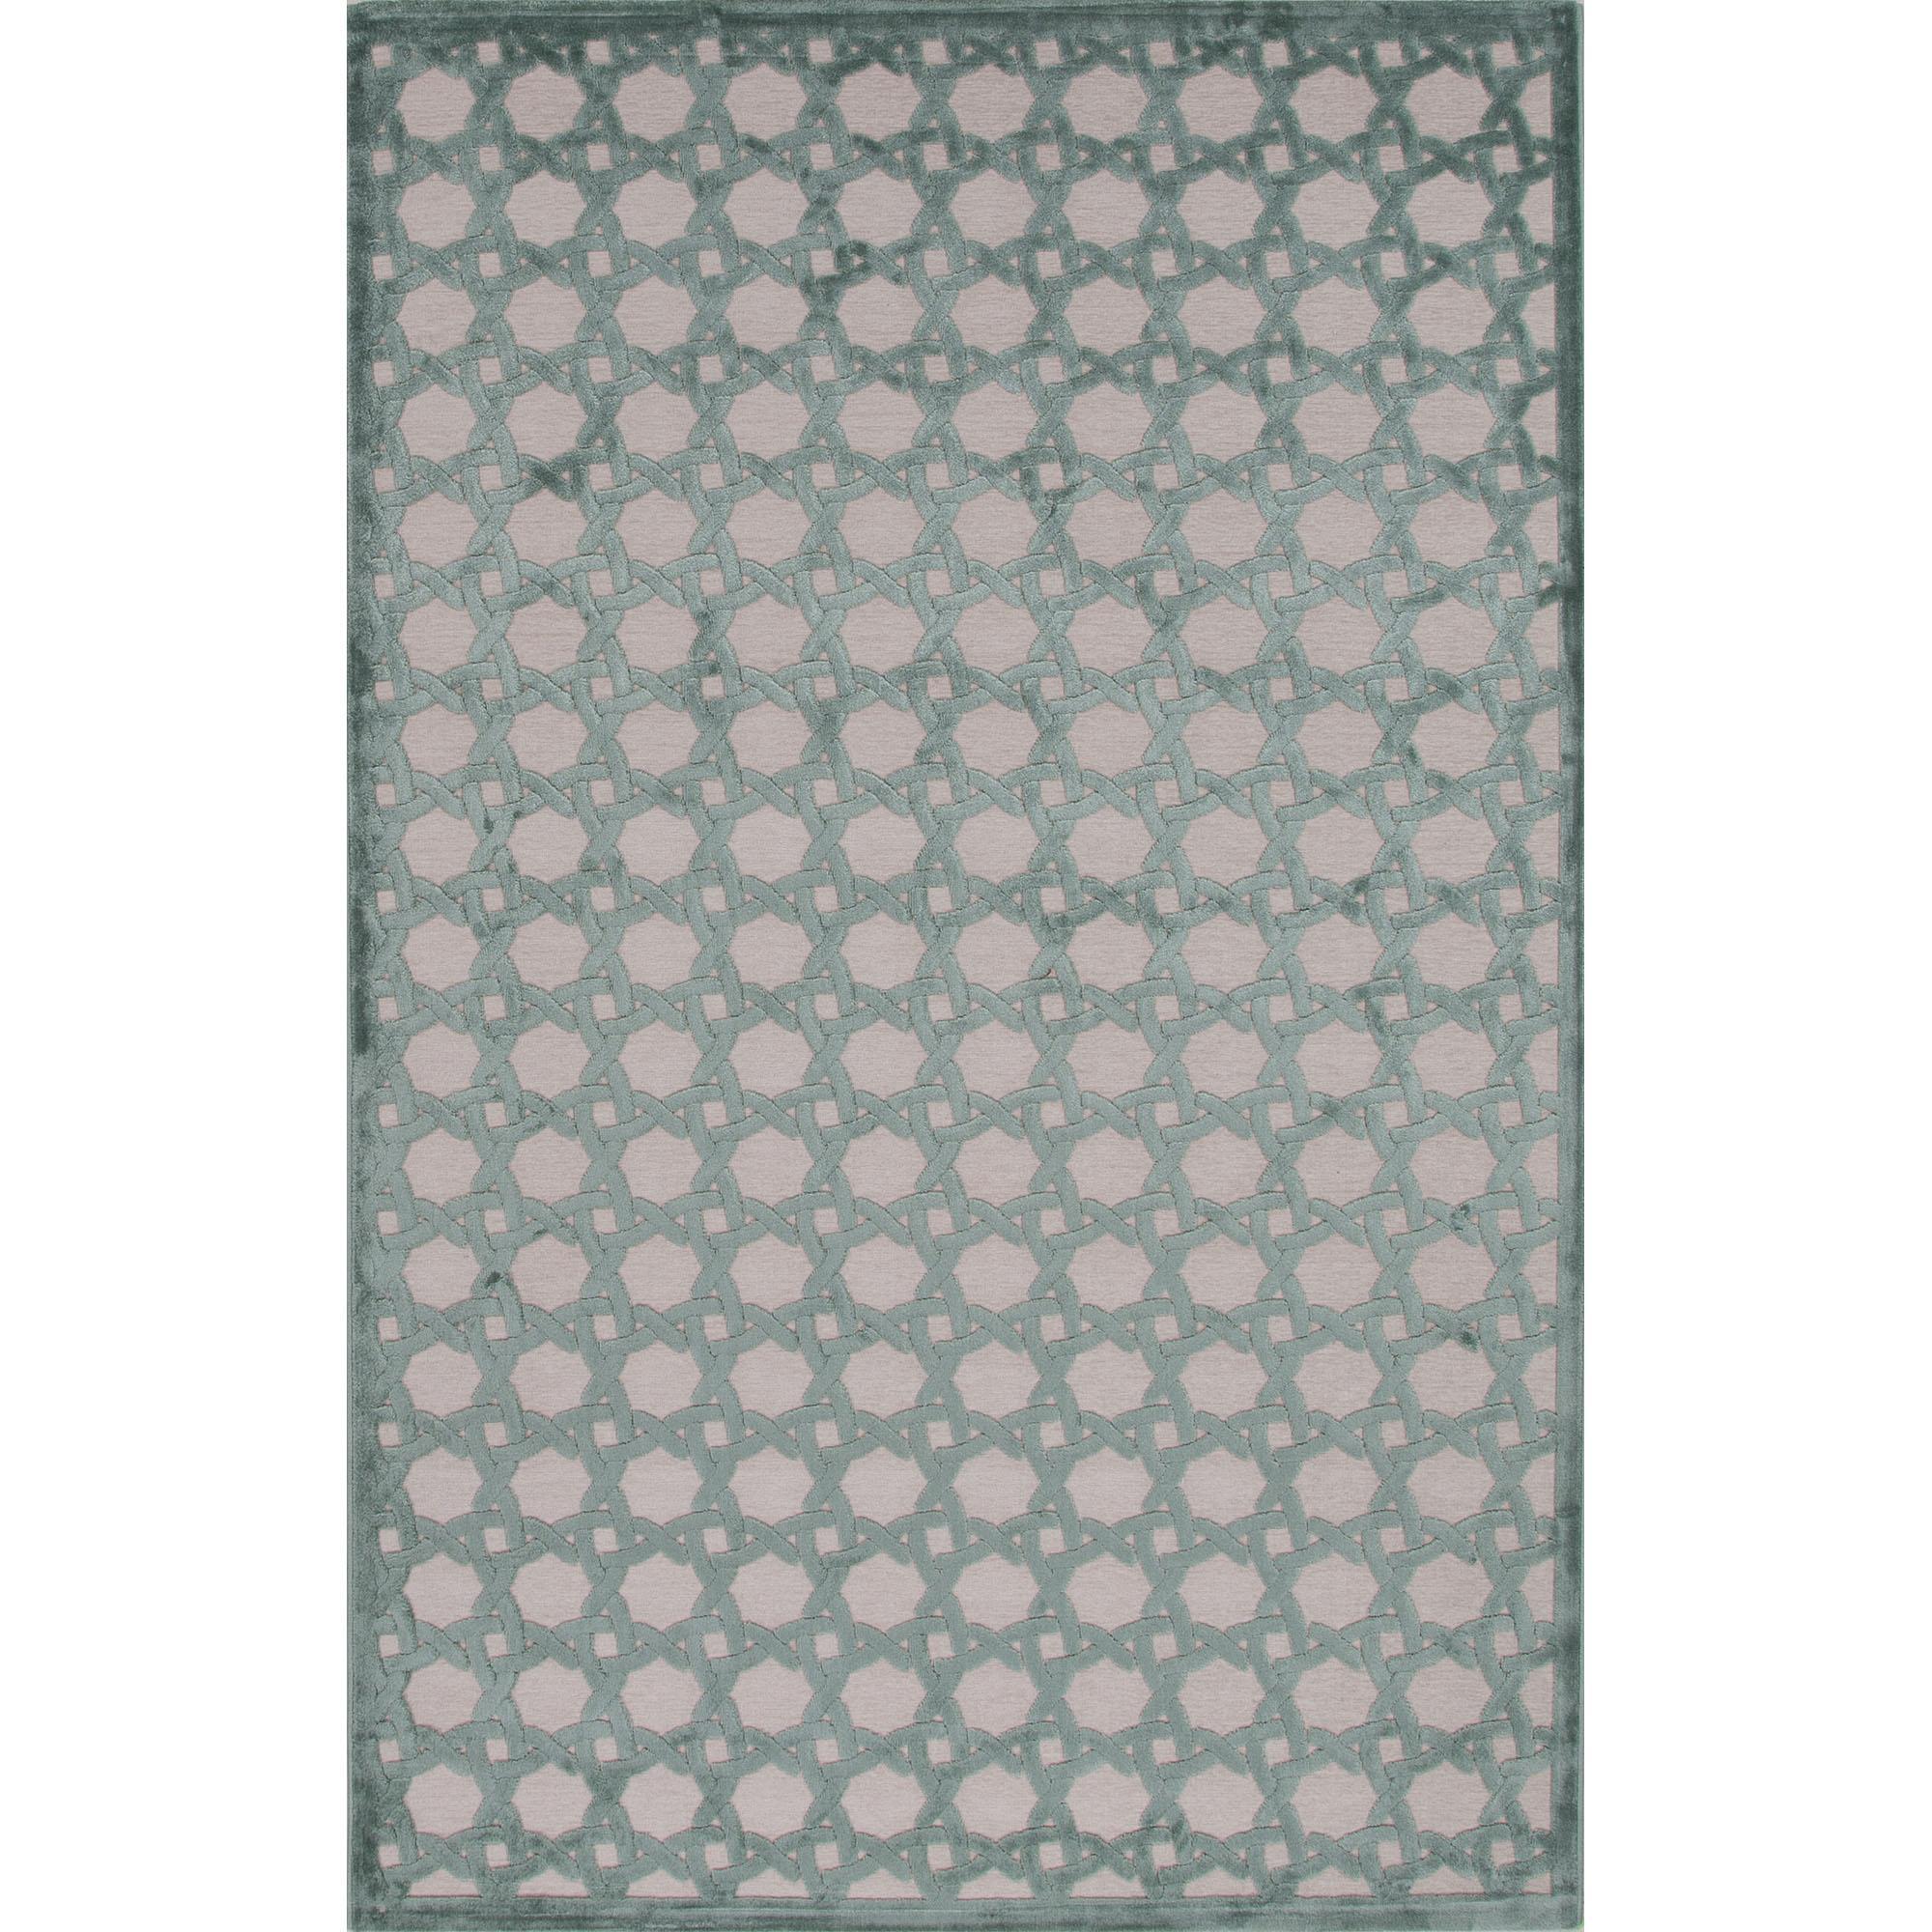 JAIPUR Rugs Fables 2 x 3 Rug - Item Number: RUG121774